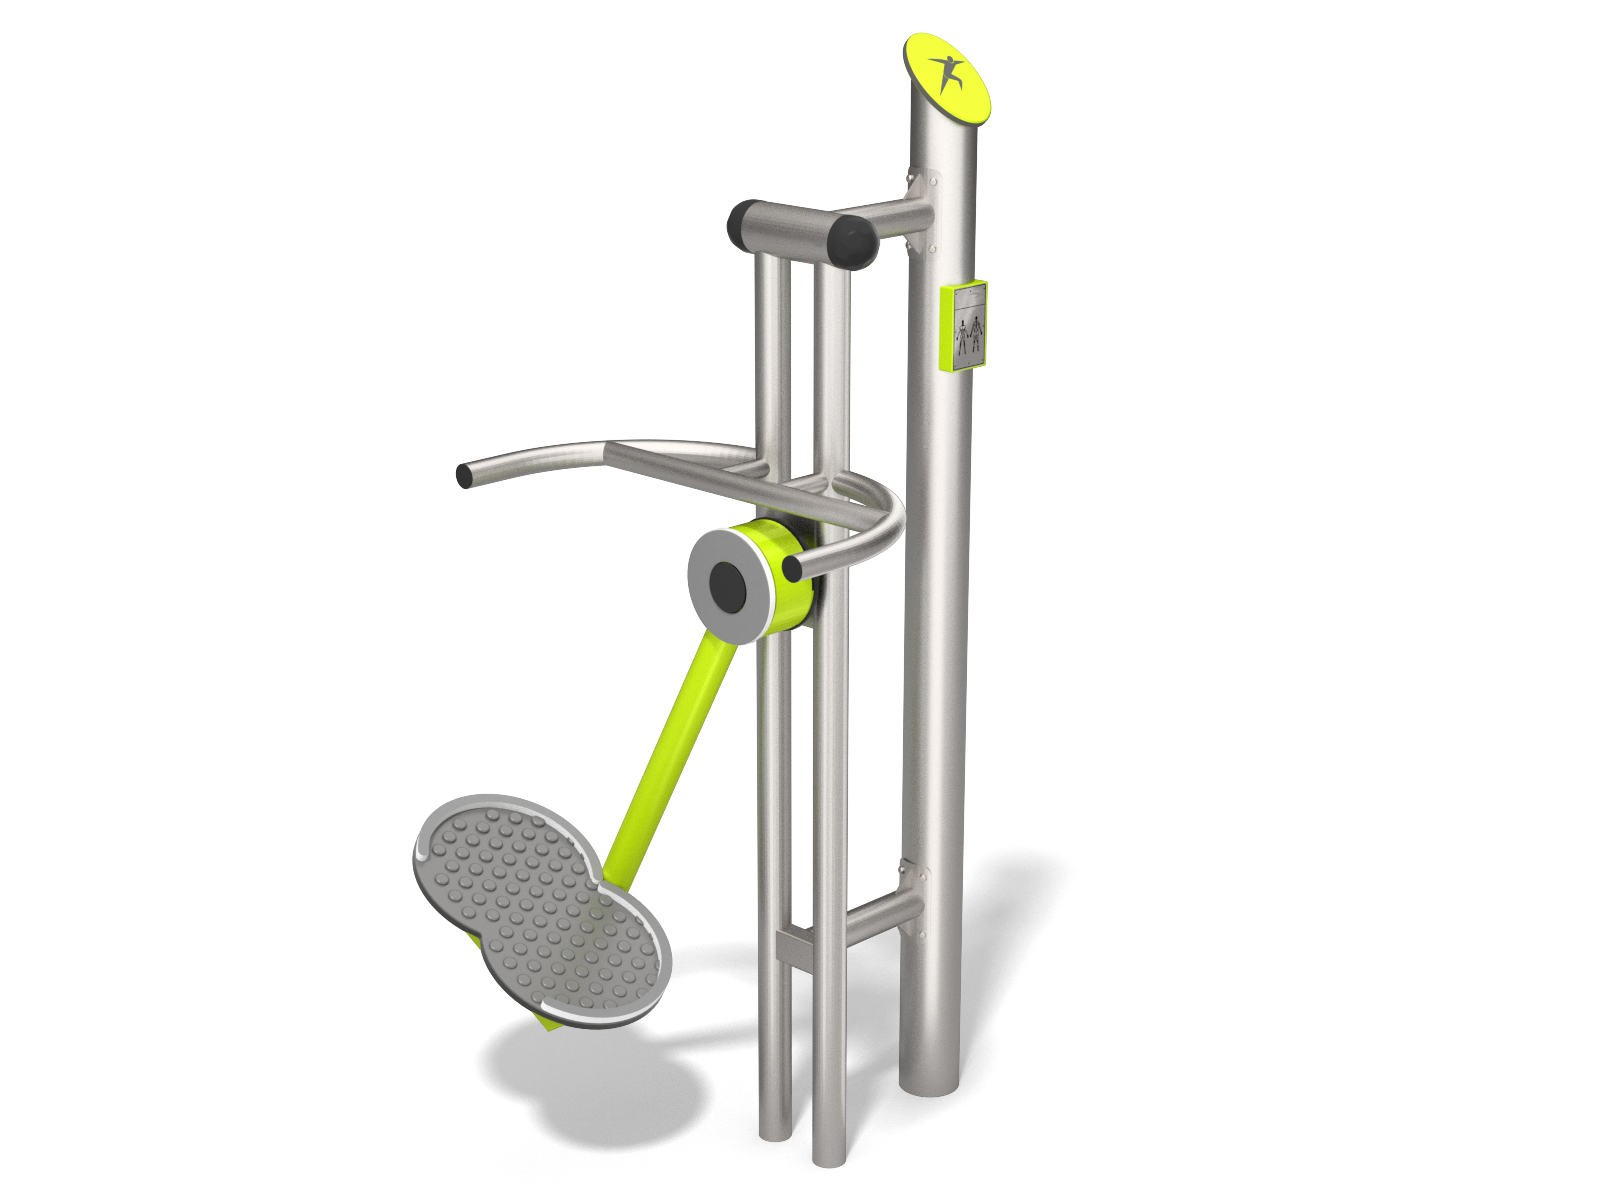 Stainless steel Ski Trainer outdoor gym